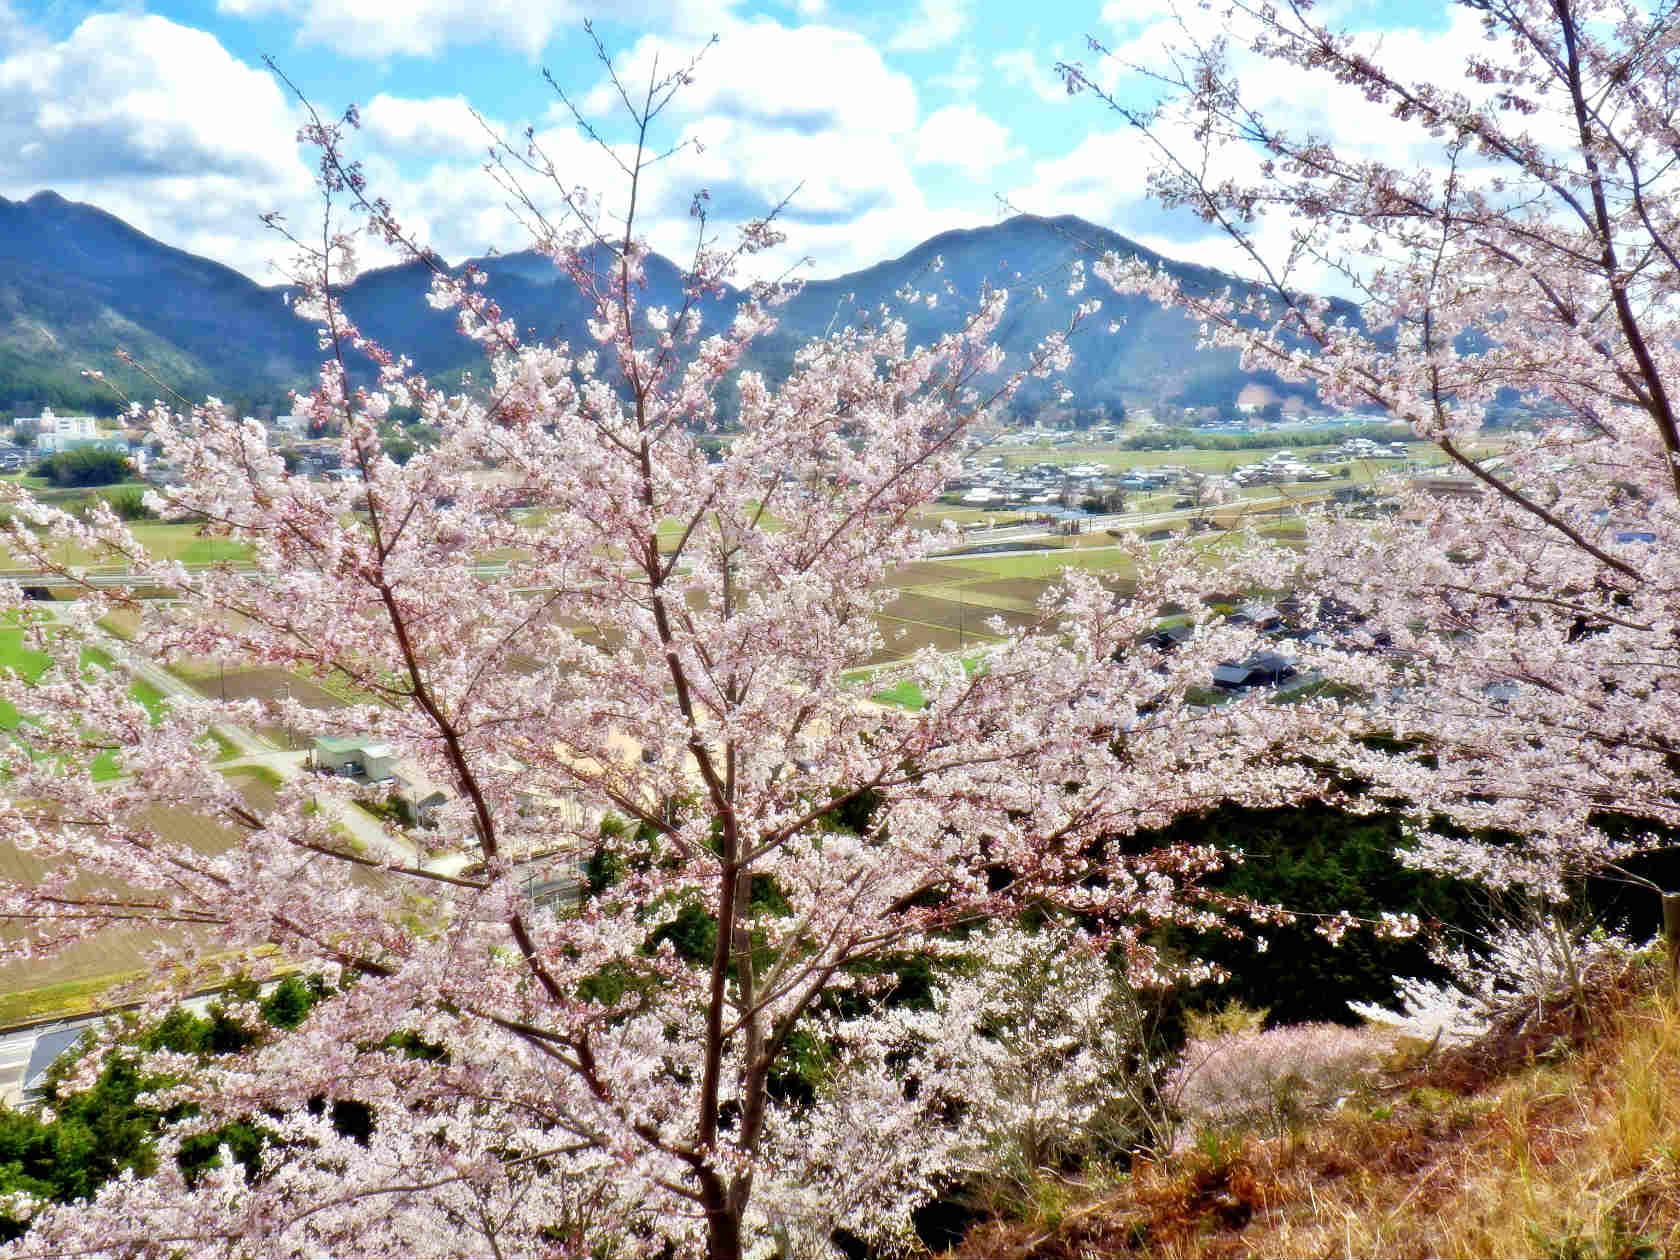 23b 桜の丘の上からの眺め